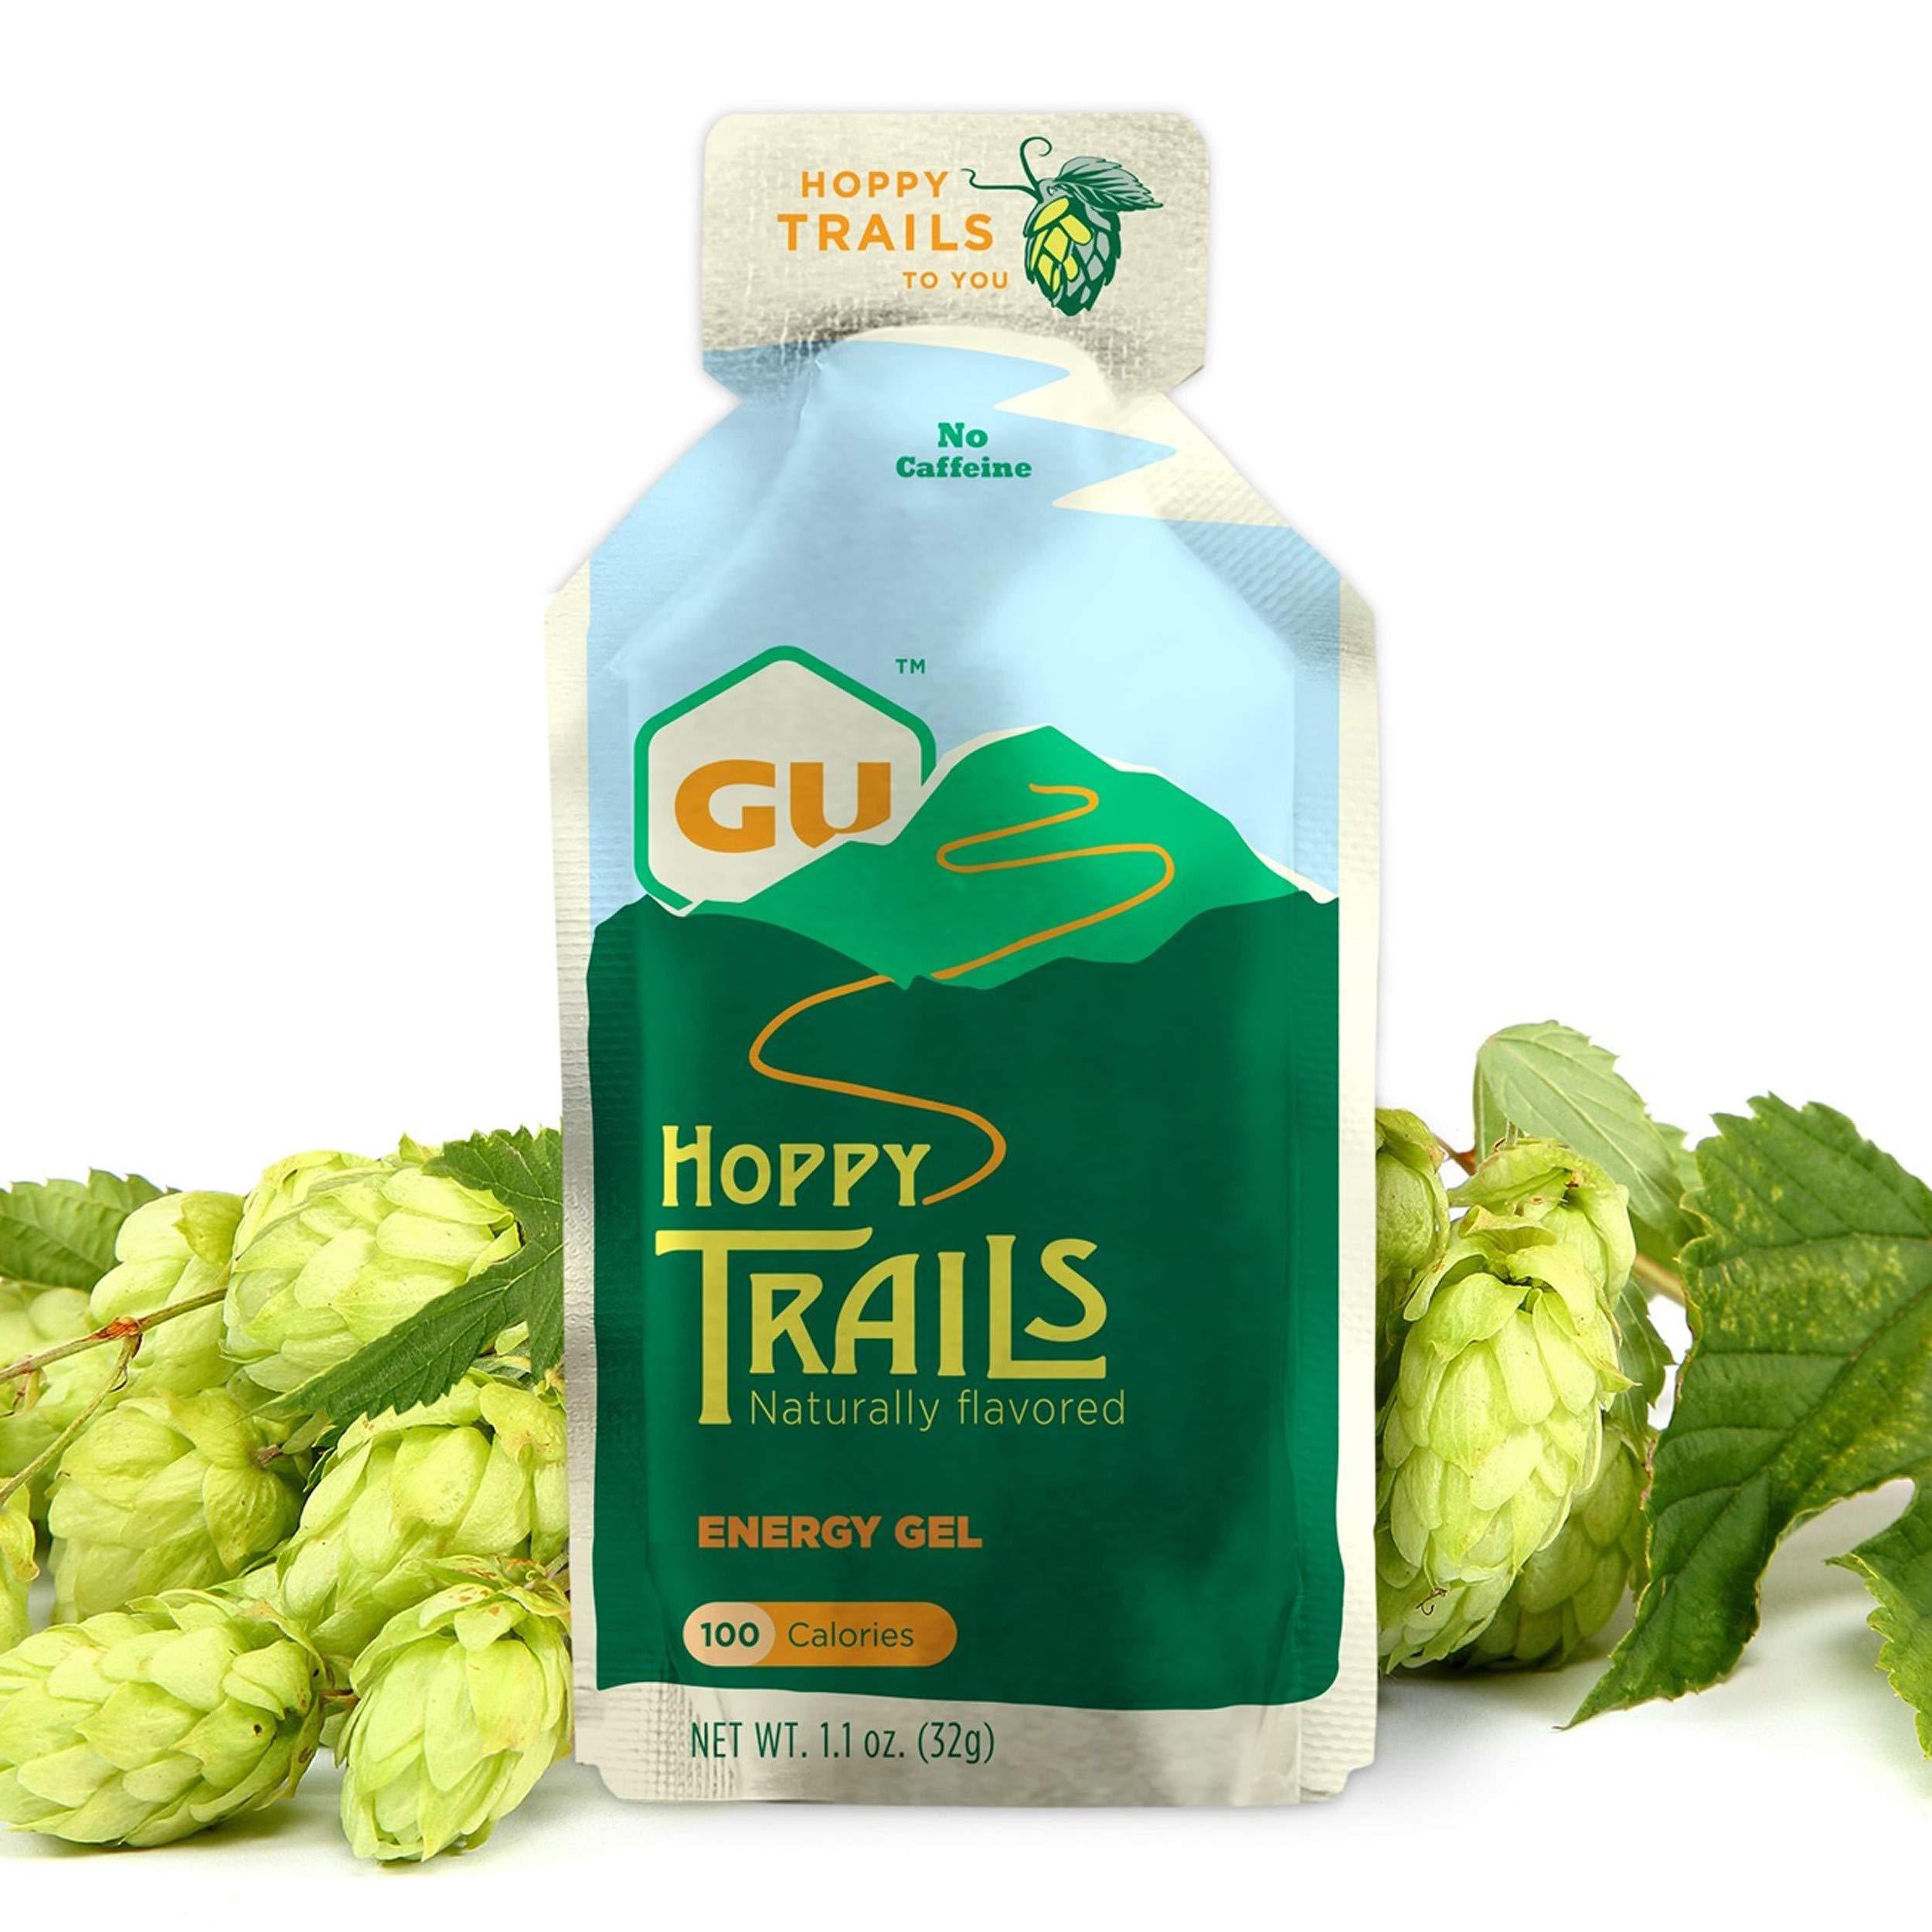 GU Energy Labs Original Sports Nutrition Energy Gel, Hoppy Trails, 24-Count Box